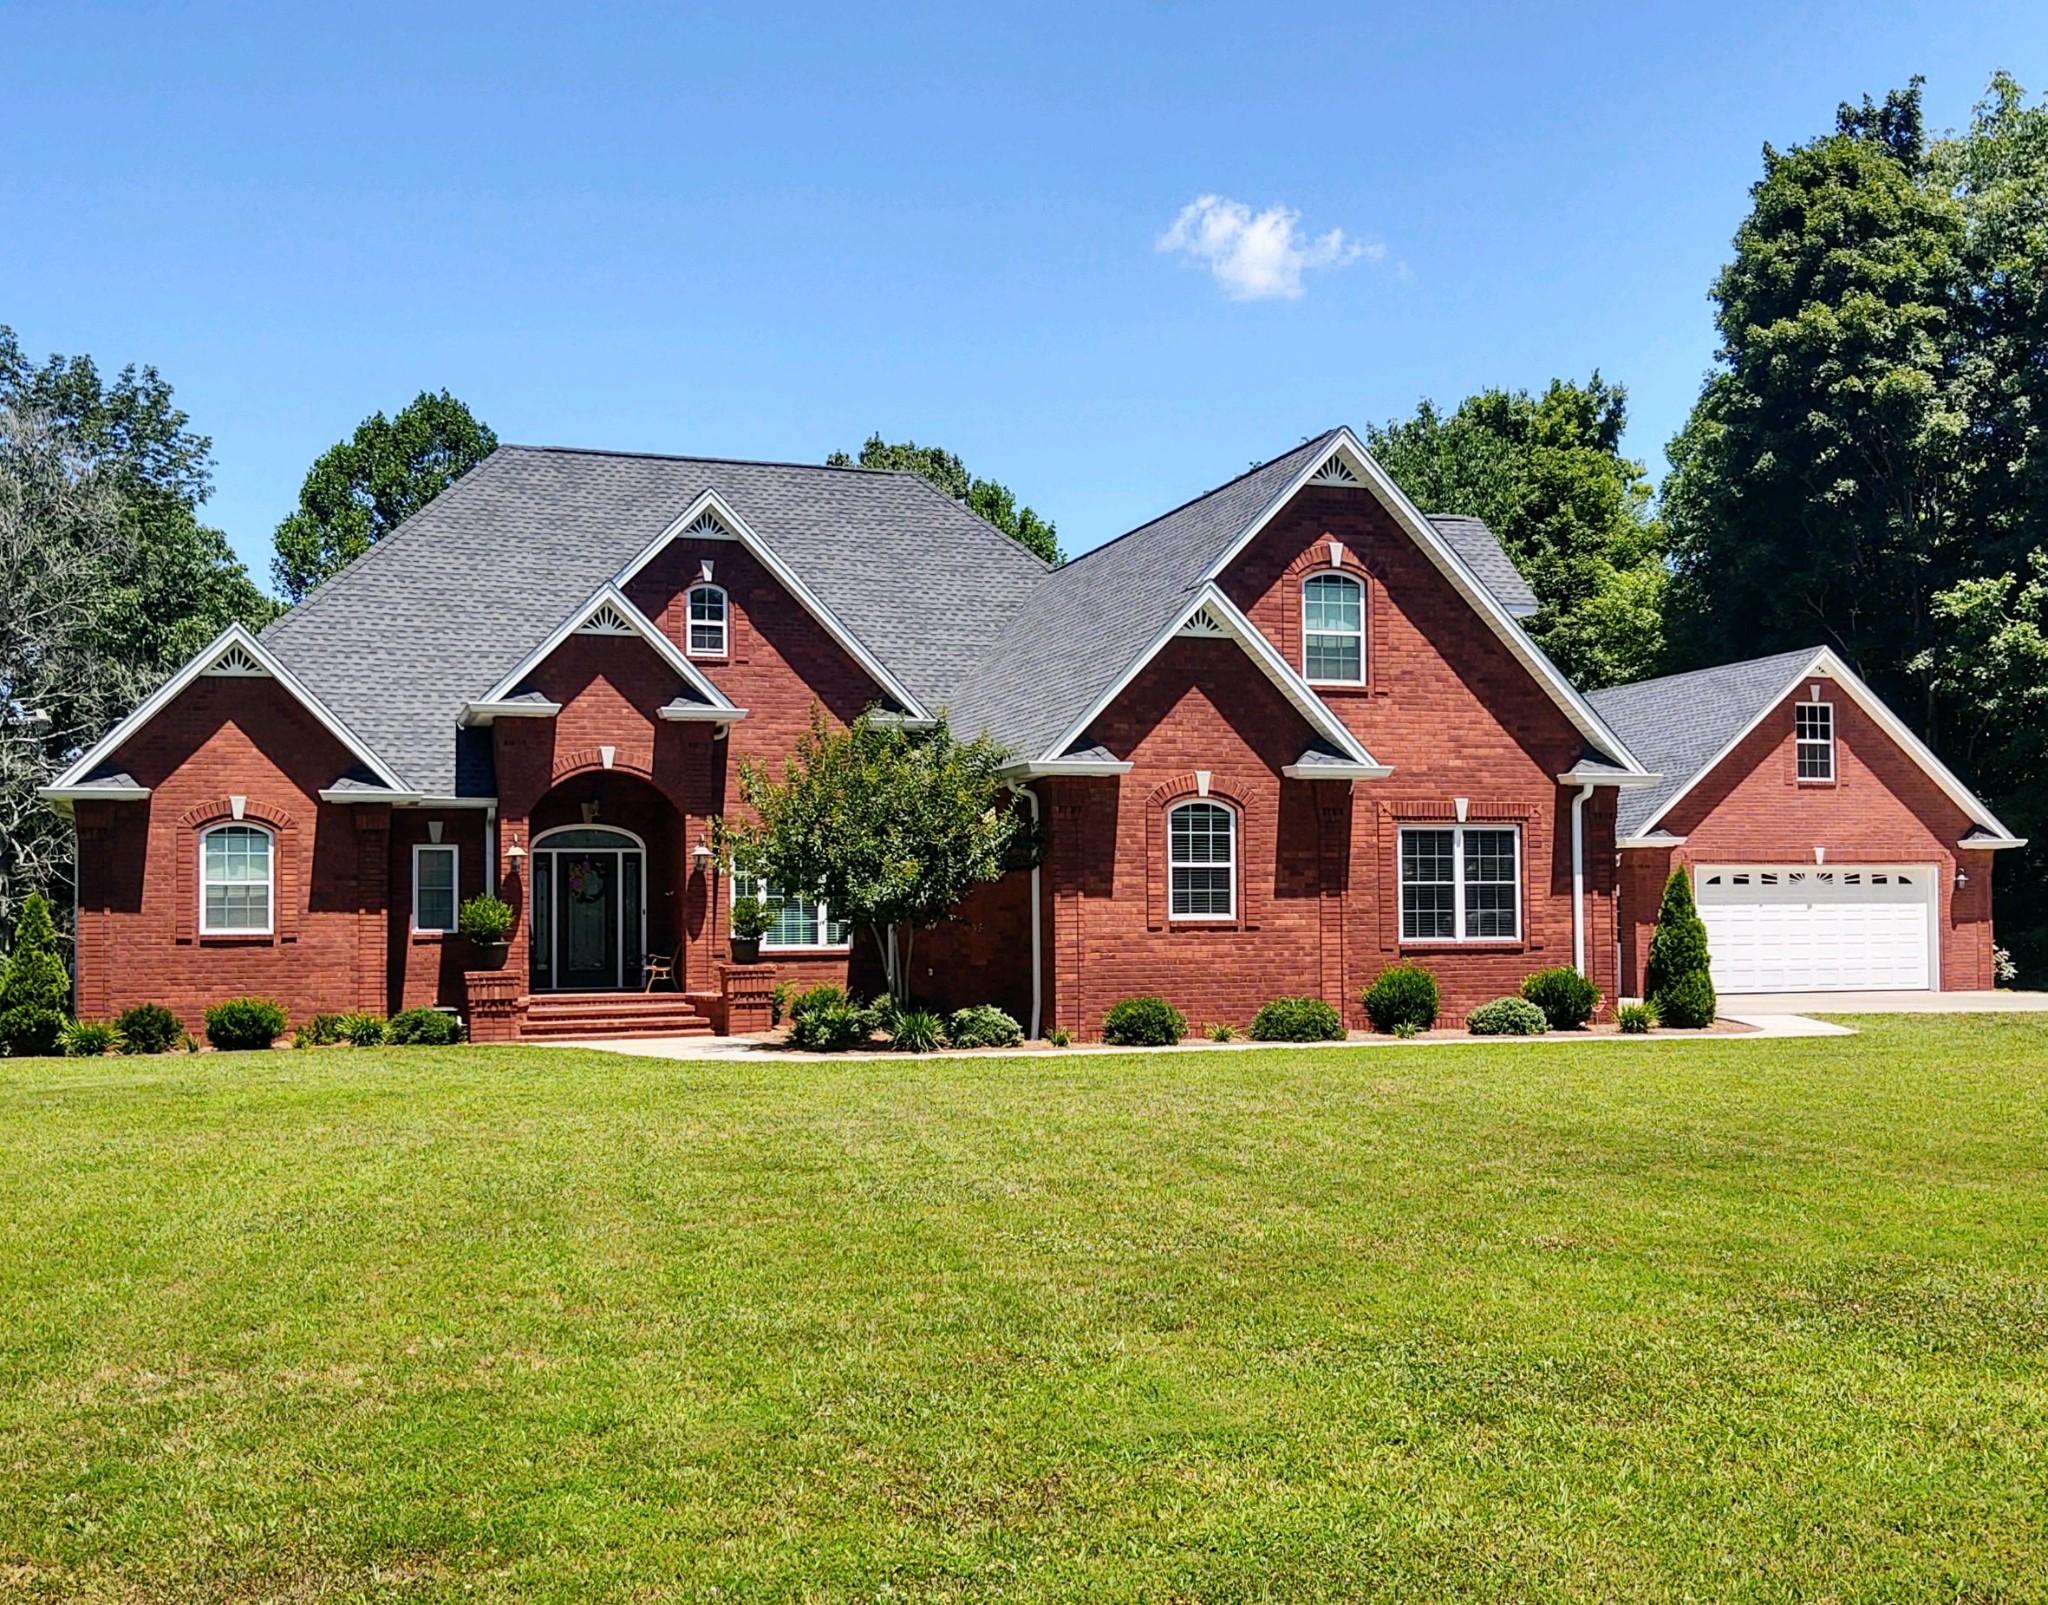 5140 HWY 52 West, Lafayette, TN 37083 - Lafayette, TN real estate listing